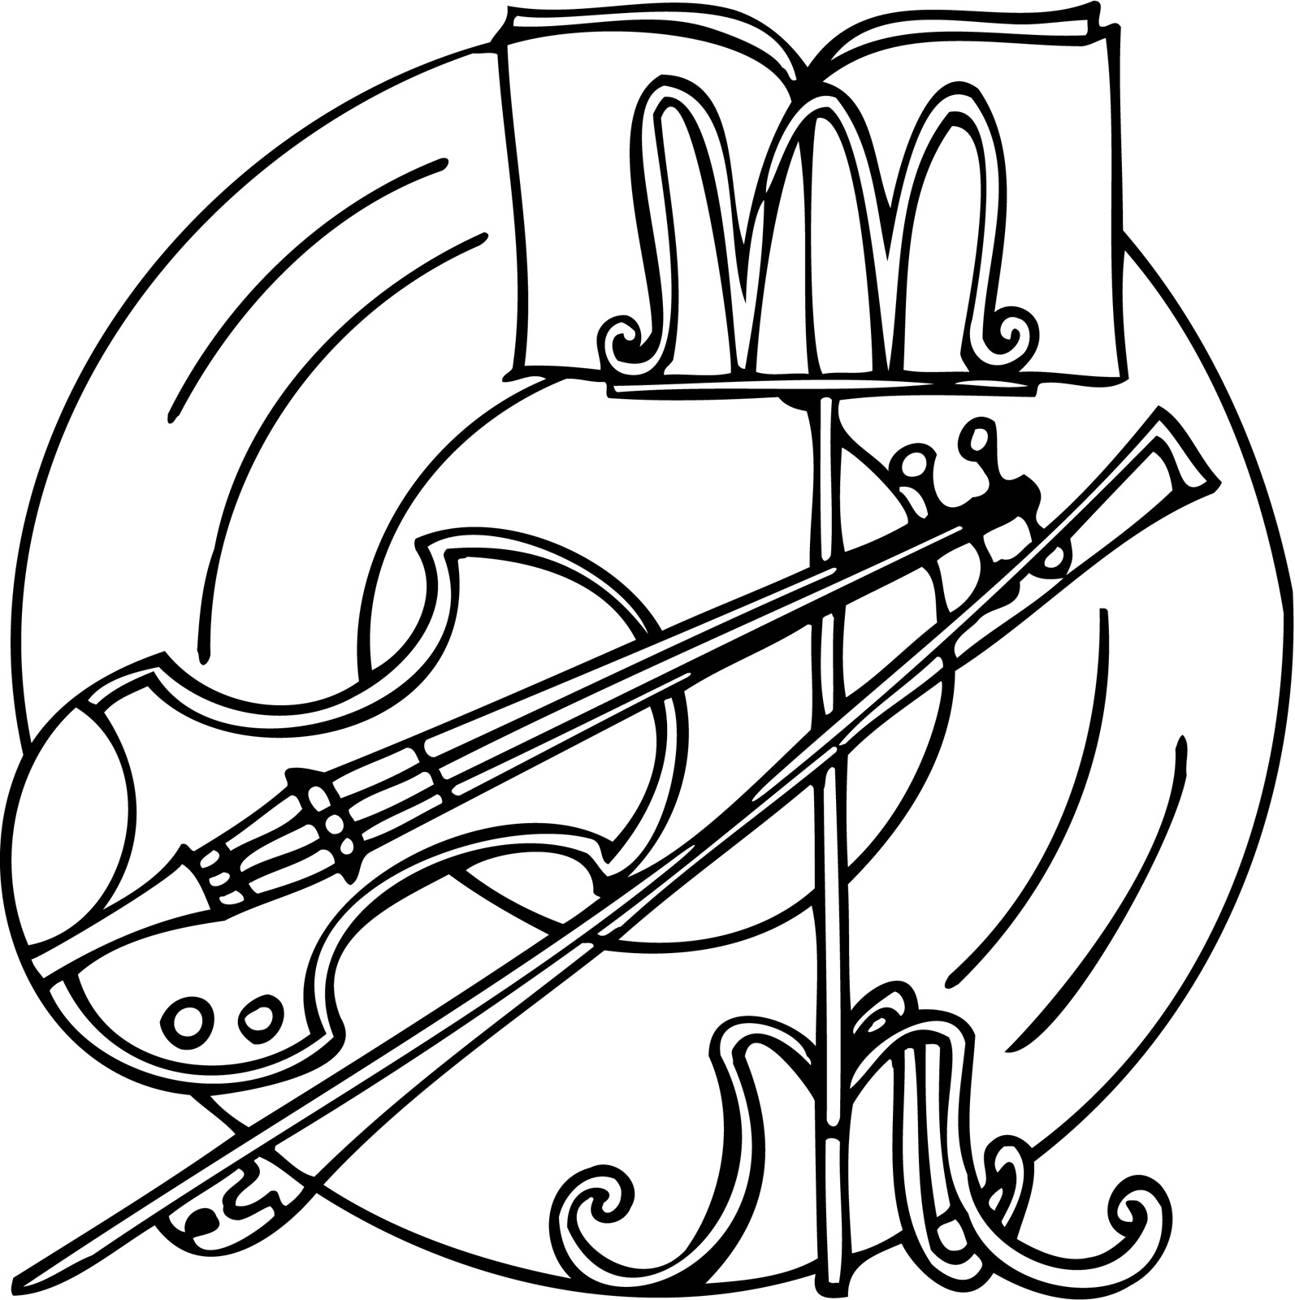 MUSIC-057